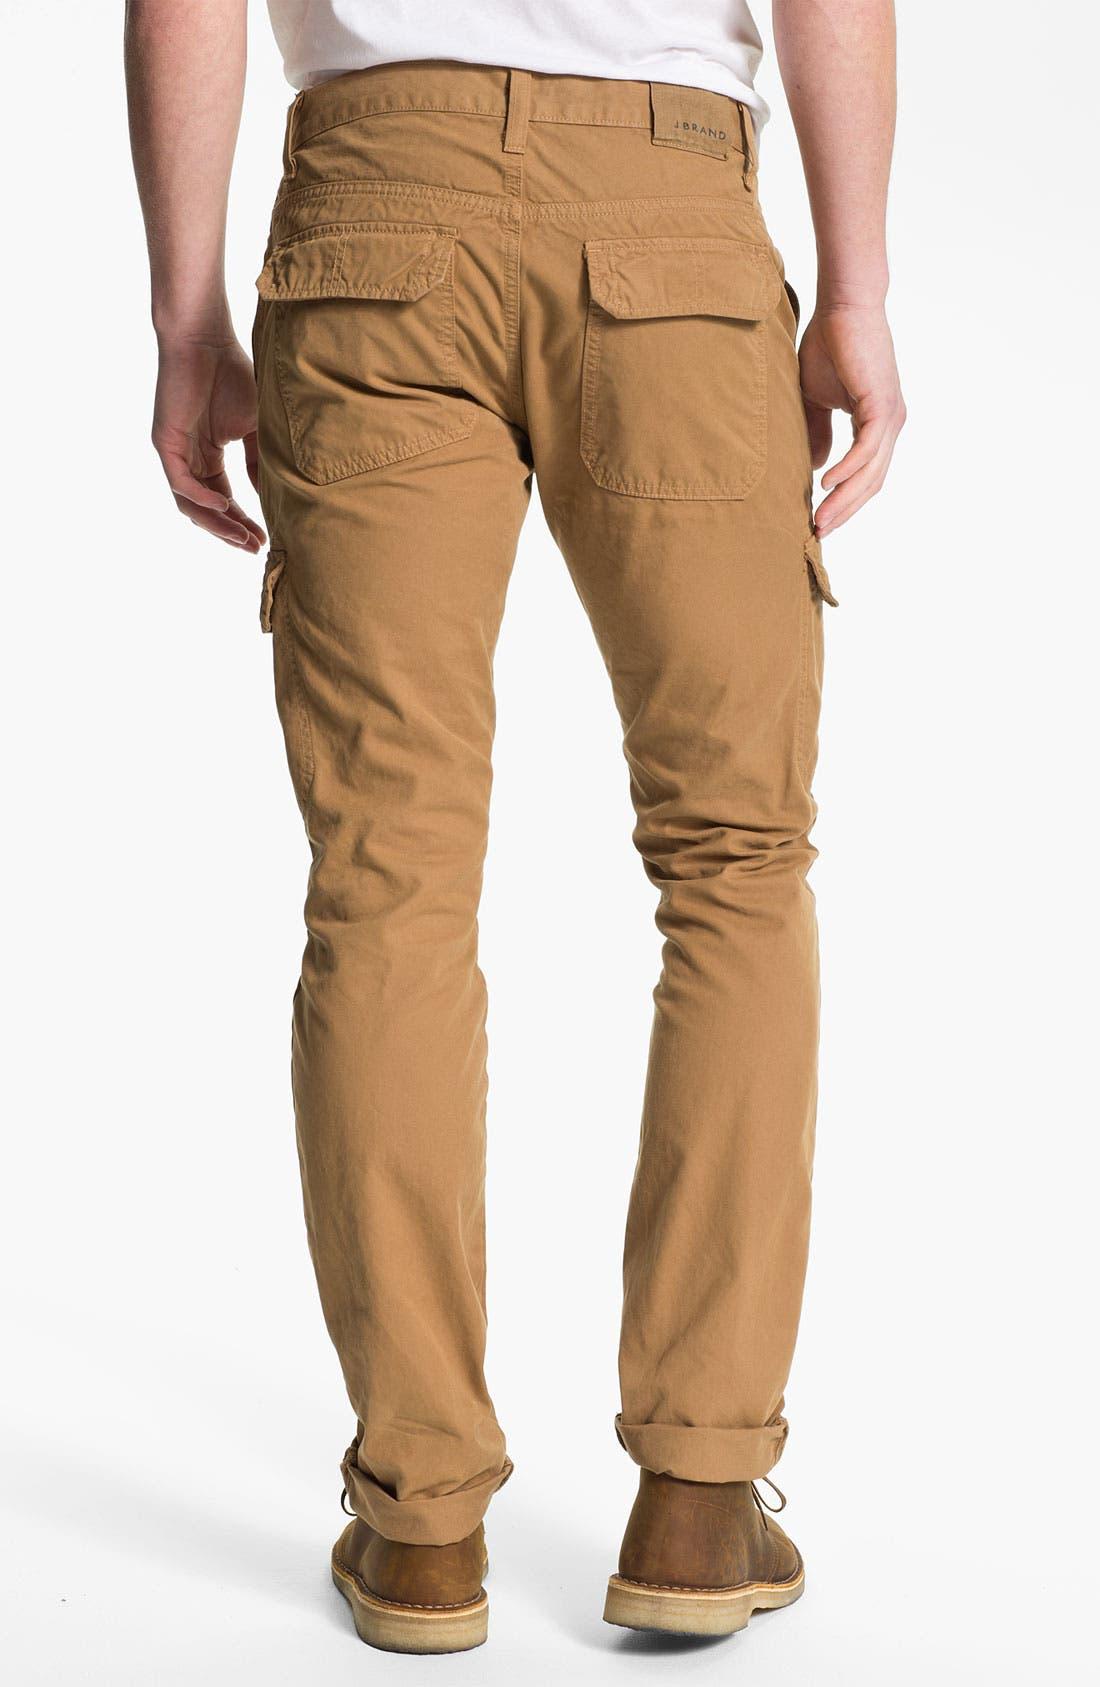 Alternate Image 1 Selected - J Brand 'Kane' Slim Straight Leg Cargo Pants (Online Exclusive)